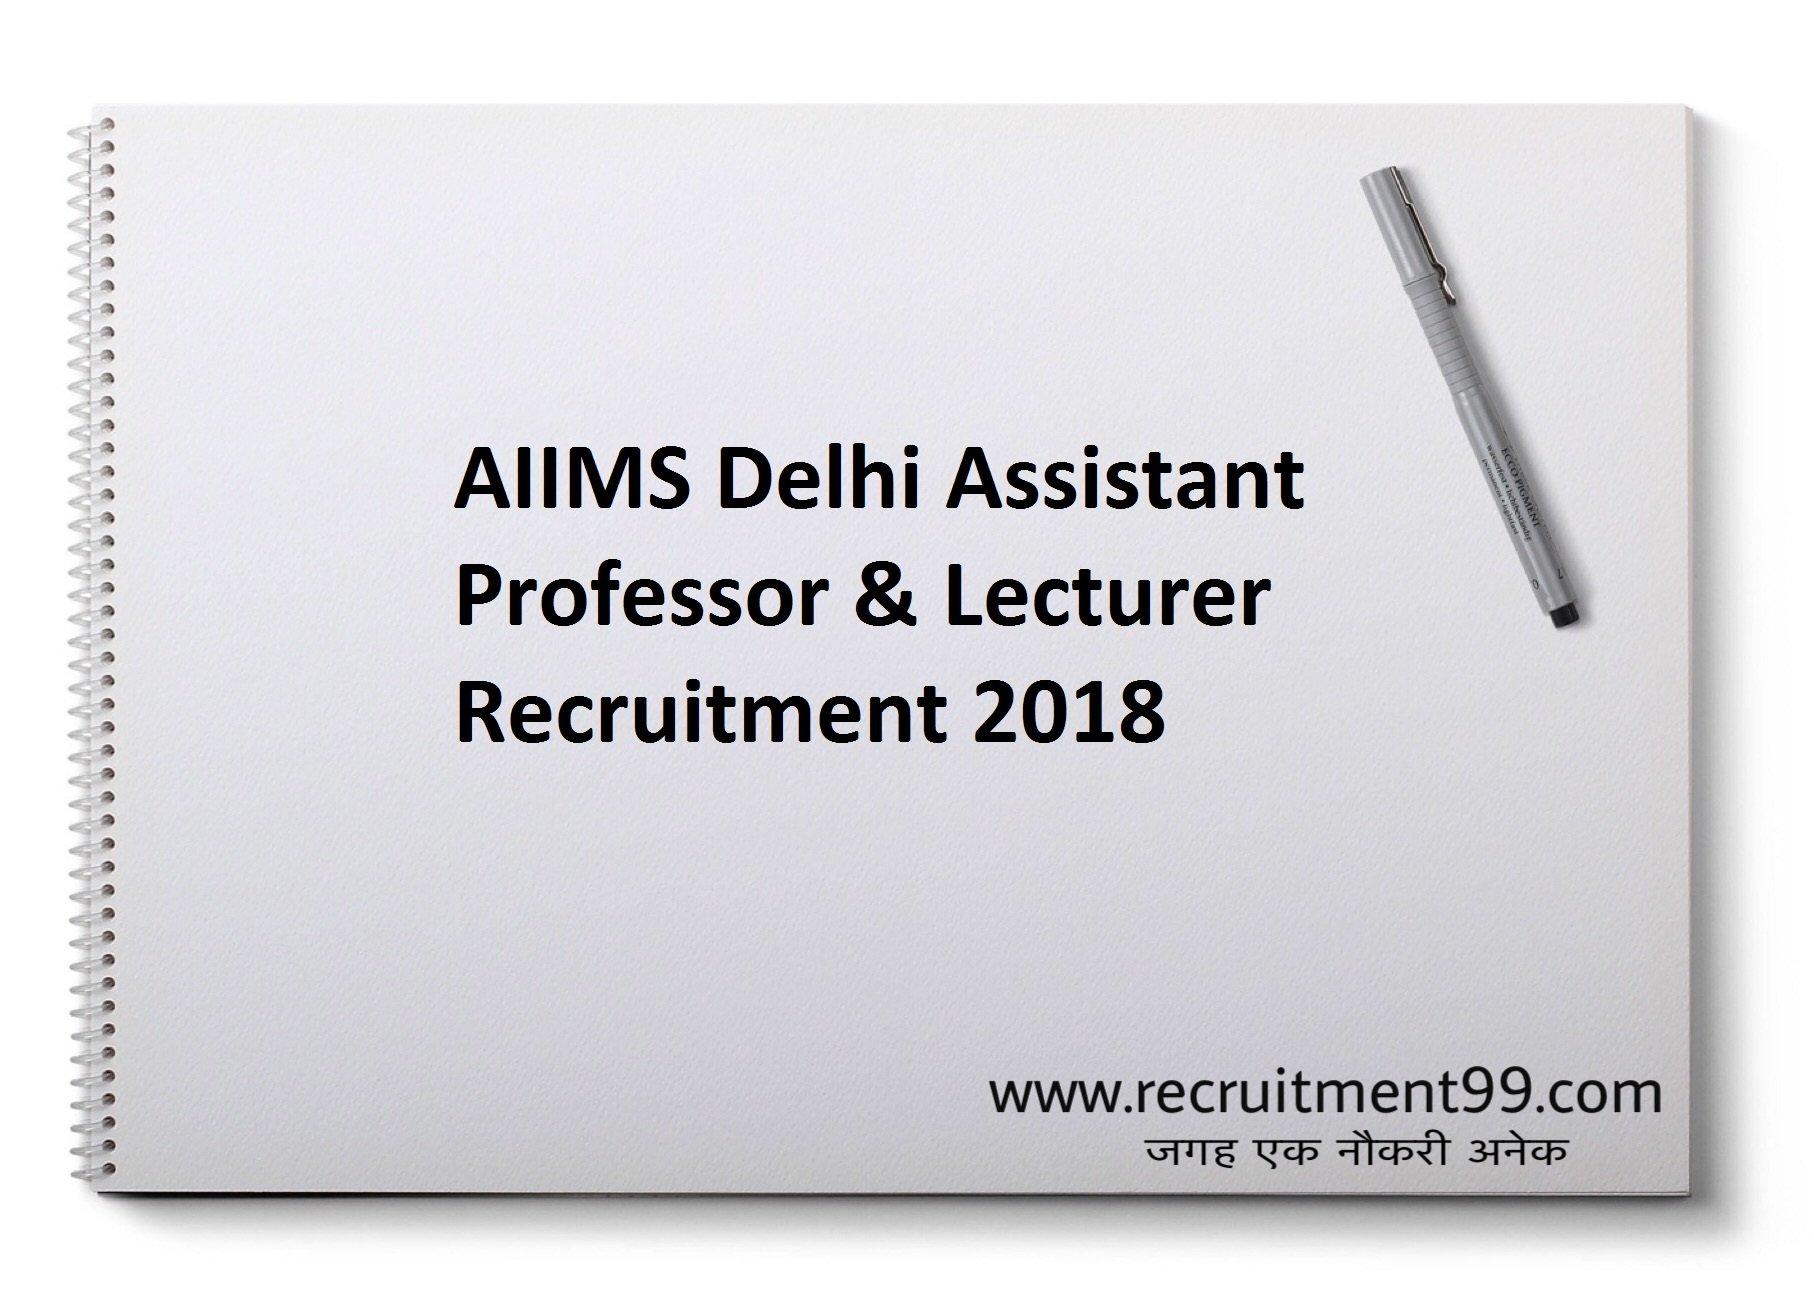 AIIMS Delhi Assistant Professor Lecturer Recruitment Admit Card Result 2018